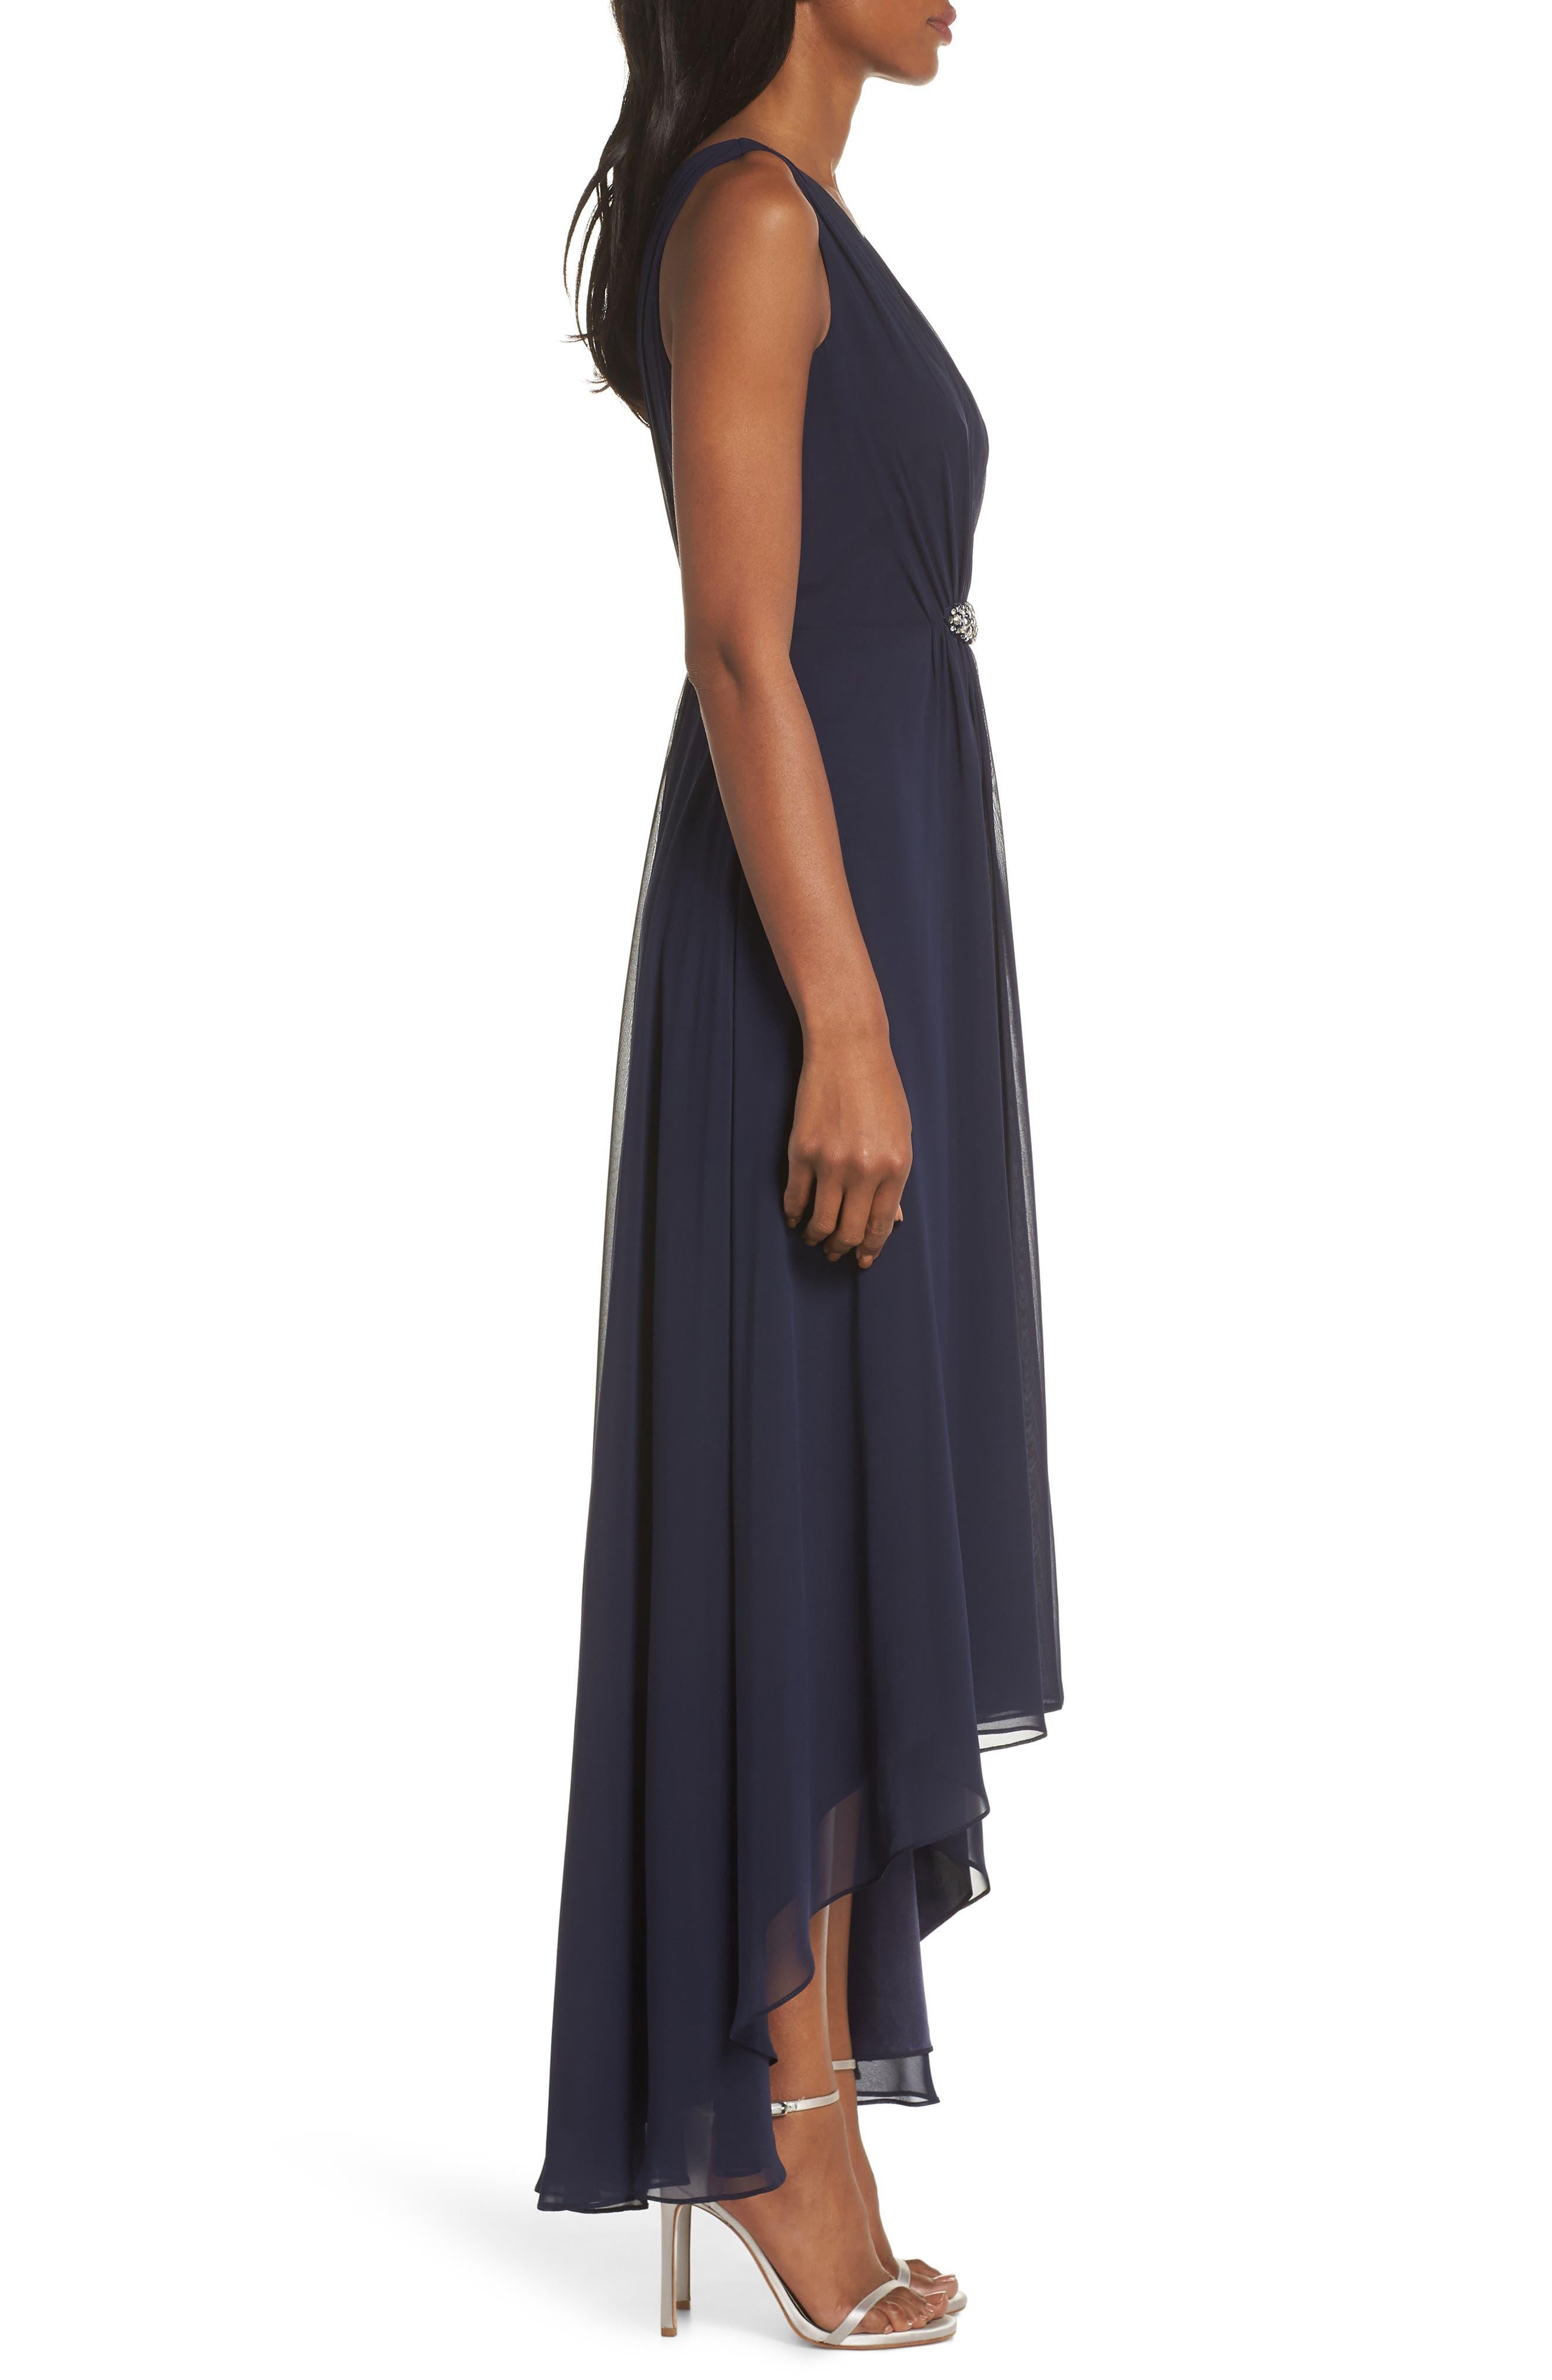 ELIZA J, Wrap Look High/Low Chiffon Dress, Alternate thumbnail 4, color, NAVY